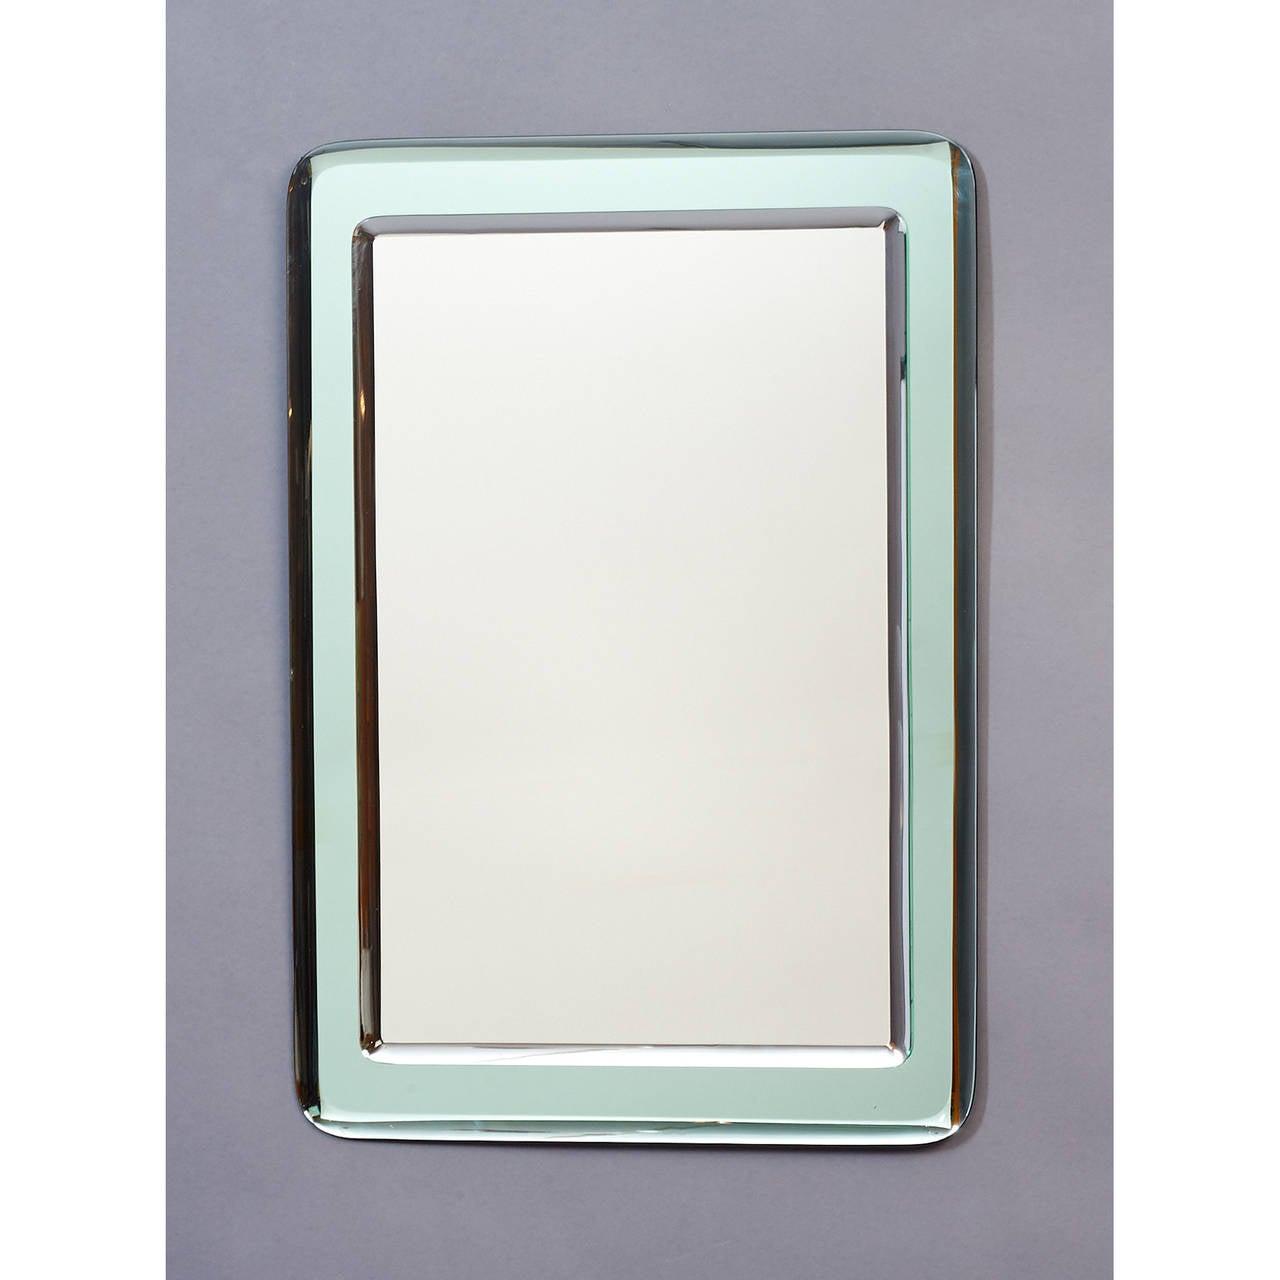 Italian Pair of Vert Nil Reverse Beveled Glass Mirror, Italy, 1970s